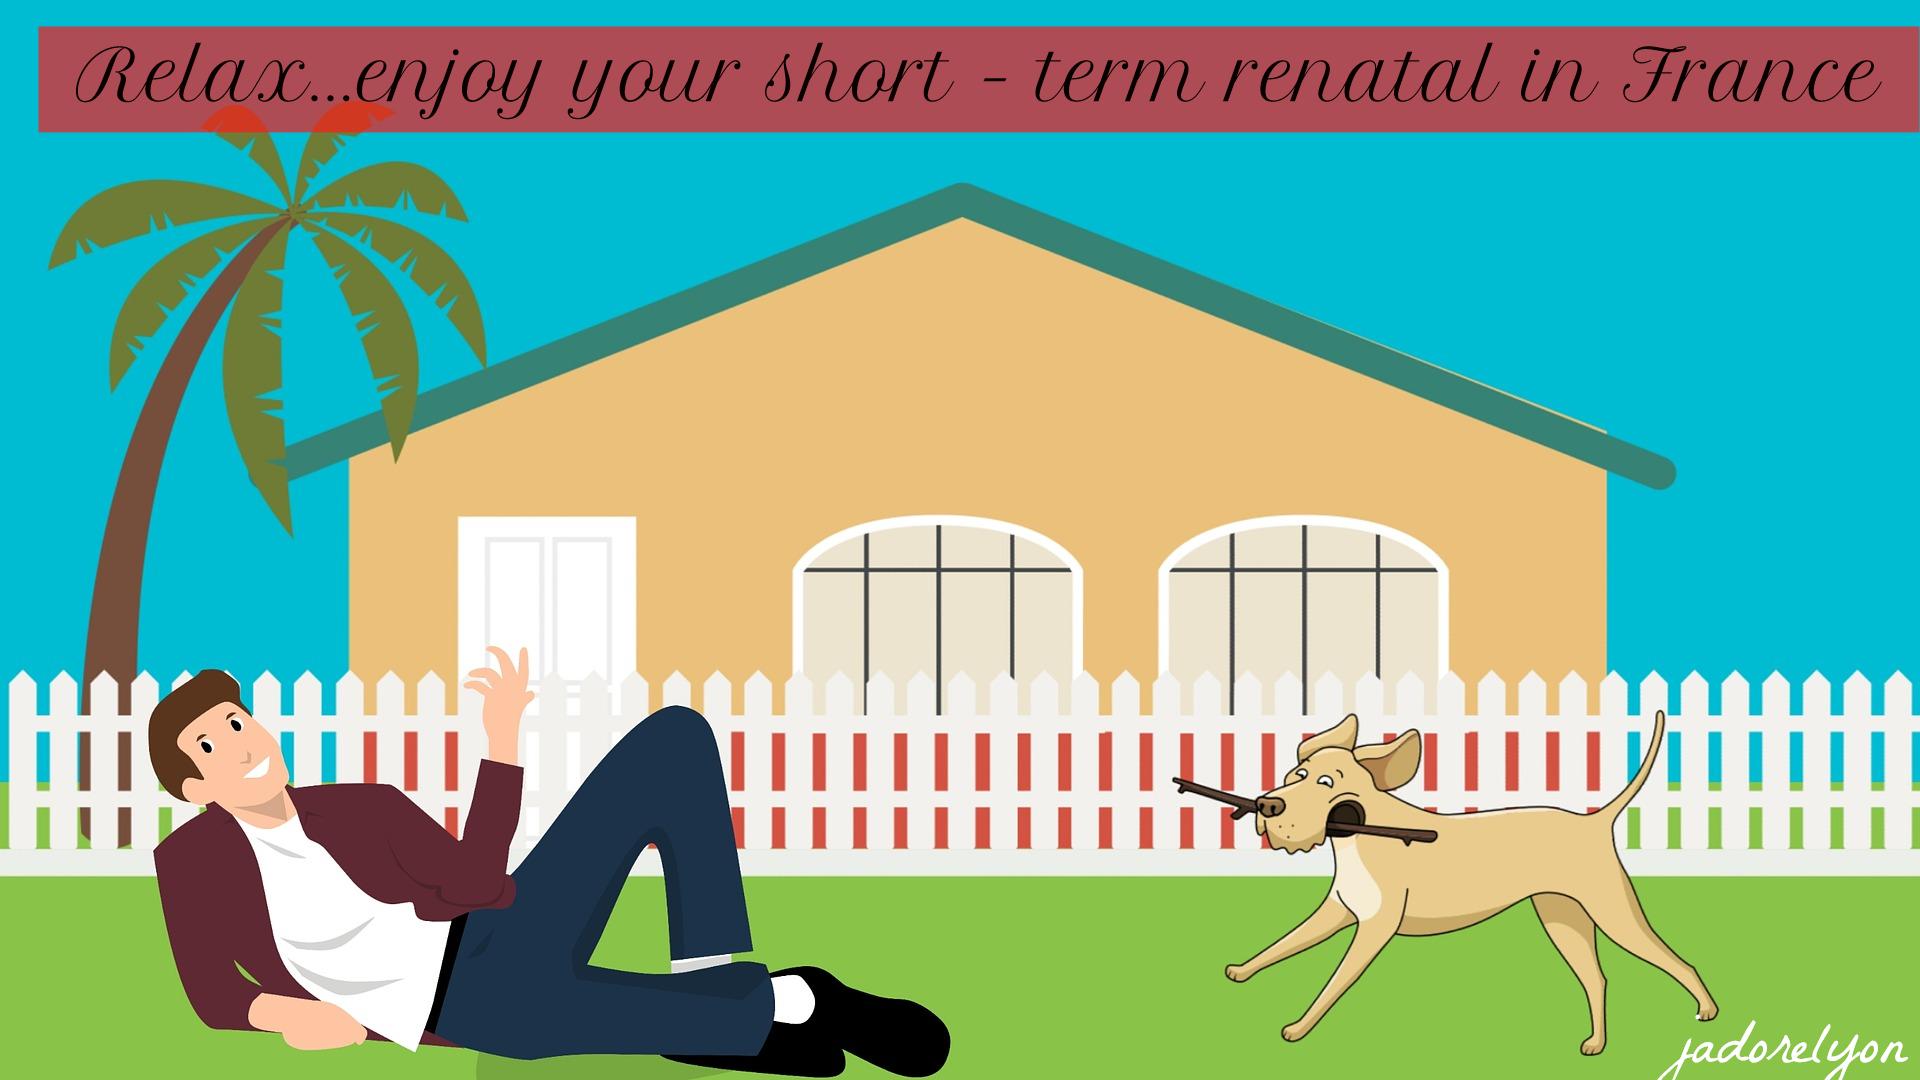 Enjoy short term rental in france